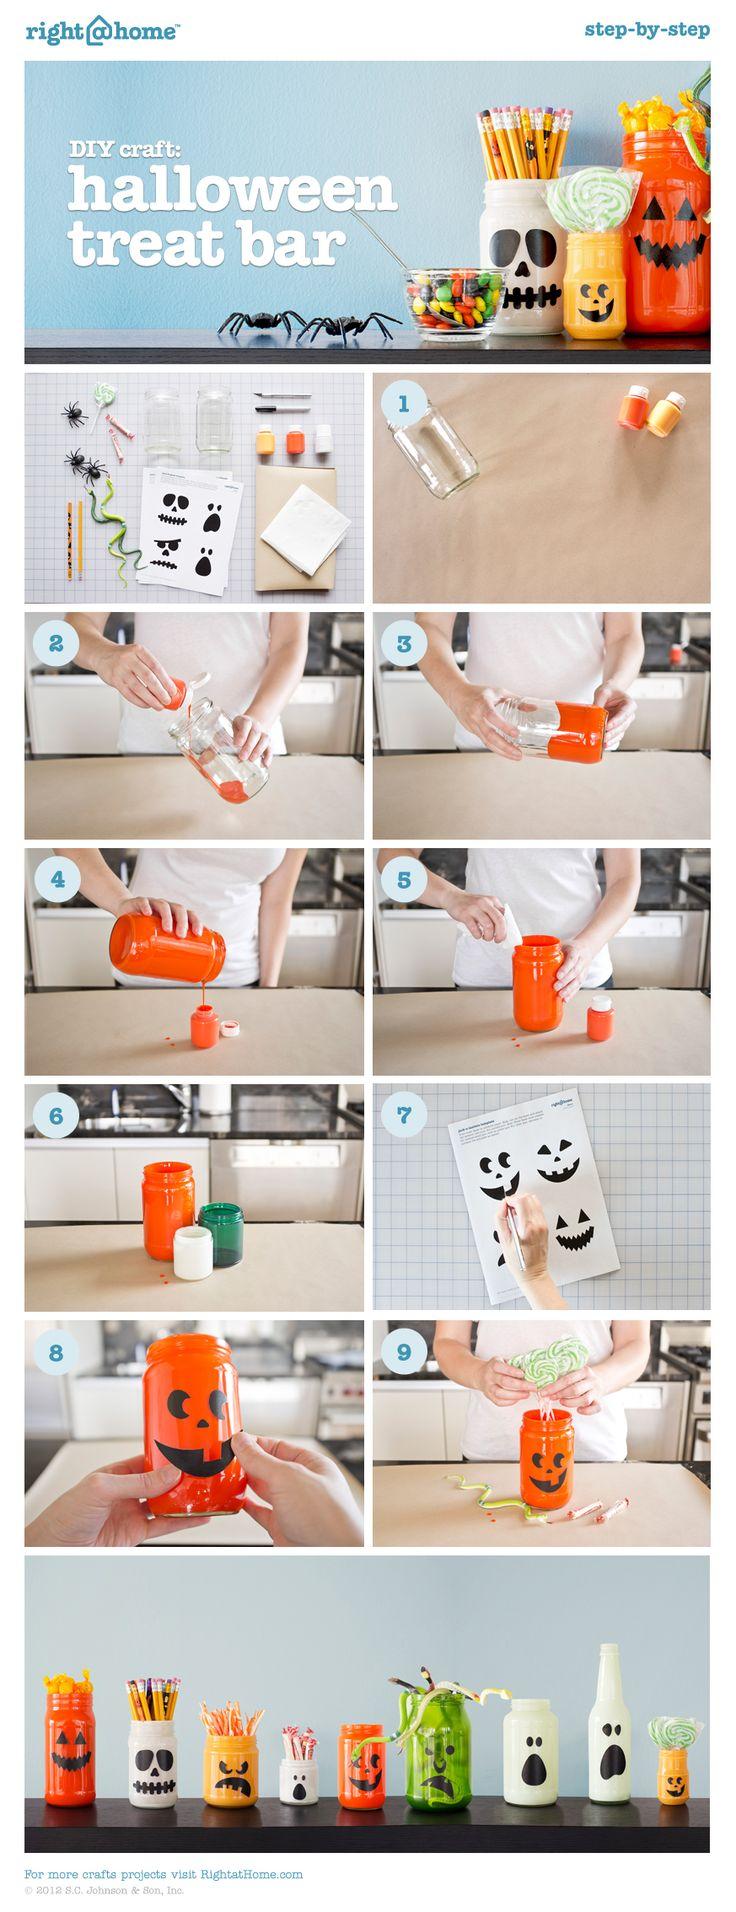 DIY Craft: Halloween Treat Bar - Put old jars to ghoulish good use.